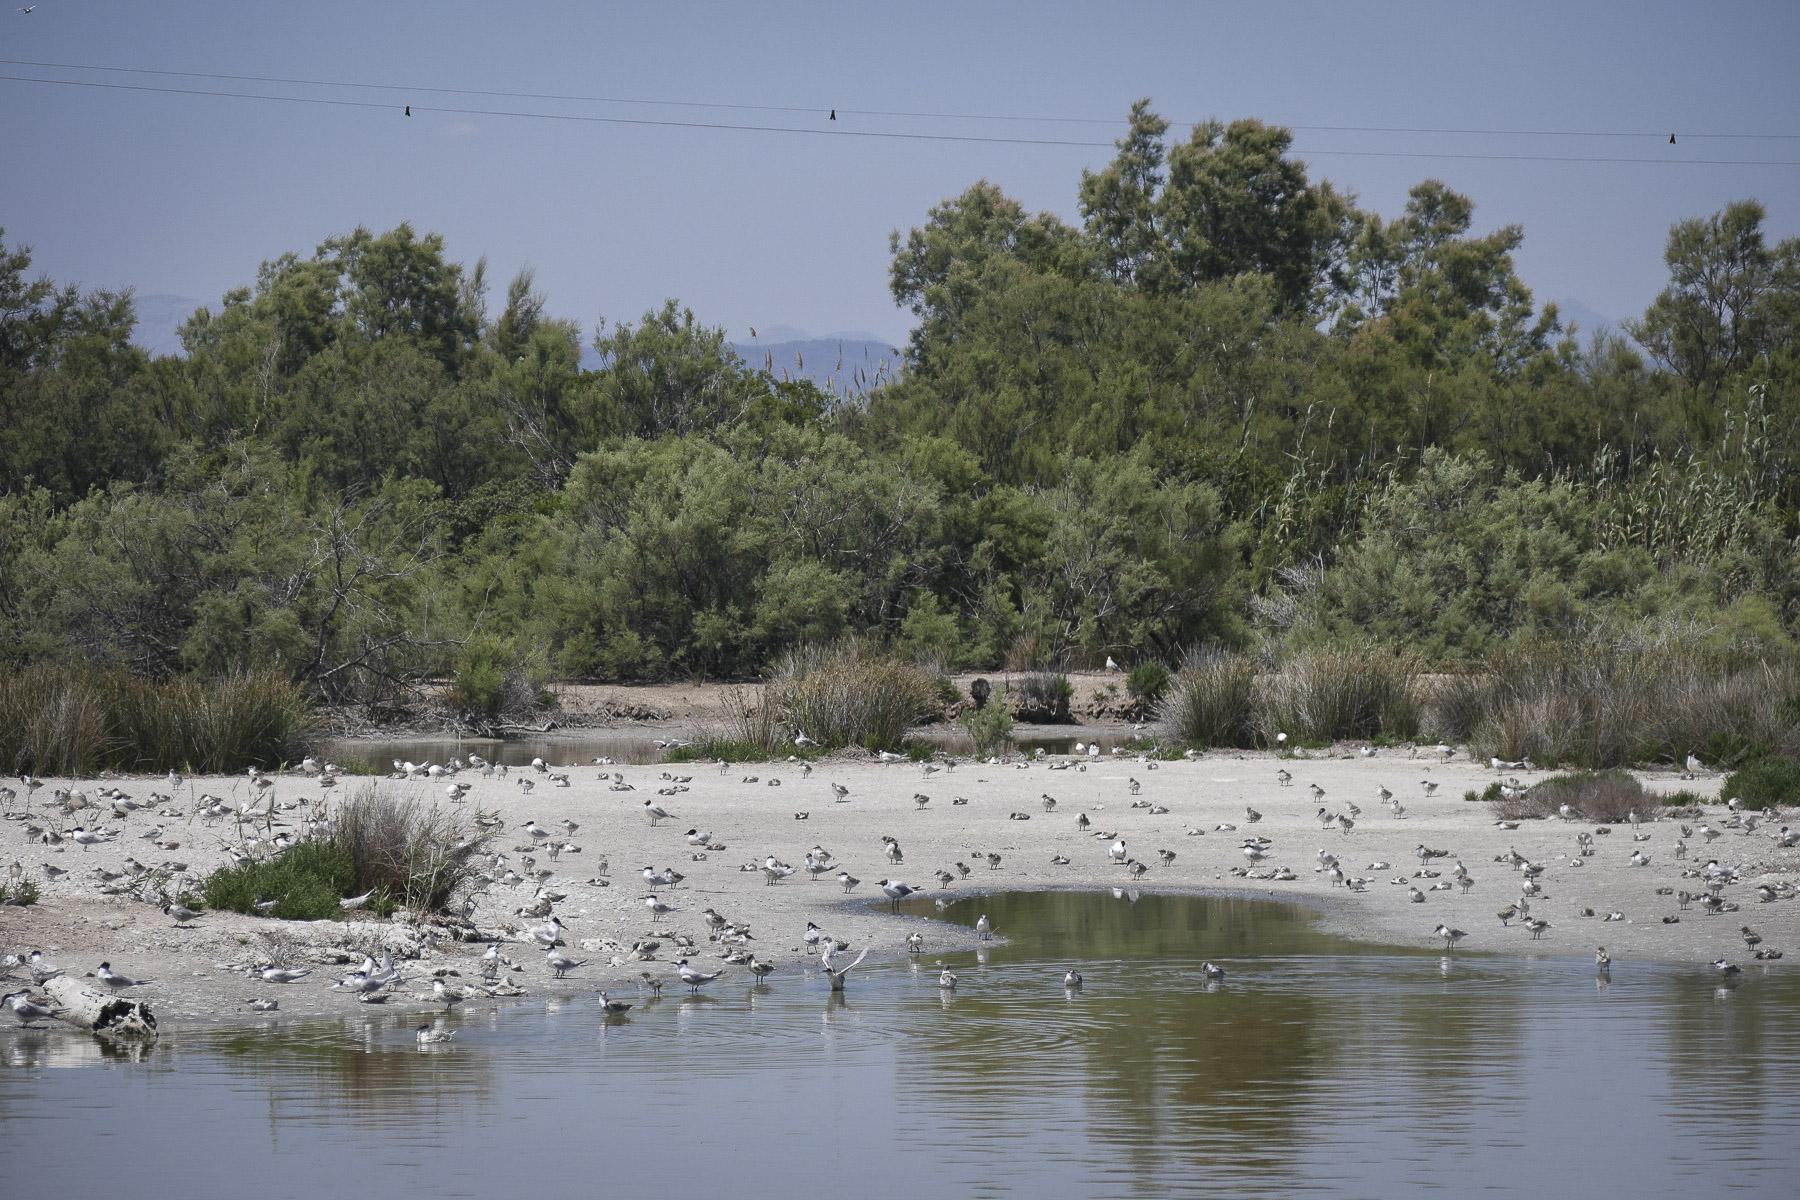 Reclaimed wetlands at El Raco de l'Olla host thousands of nesting waterbirds. Noah Strycker